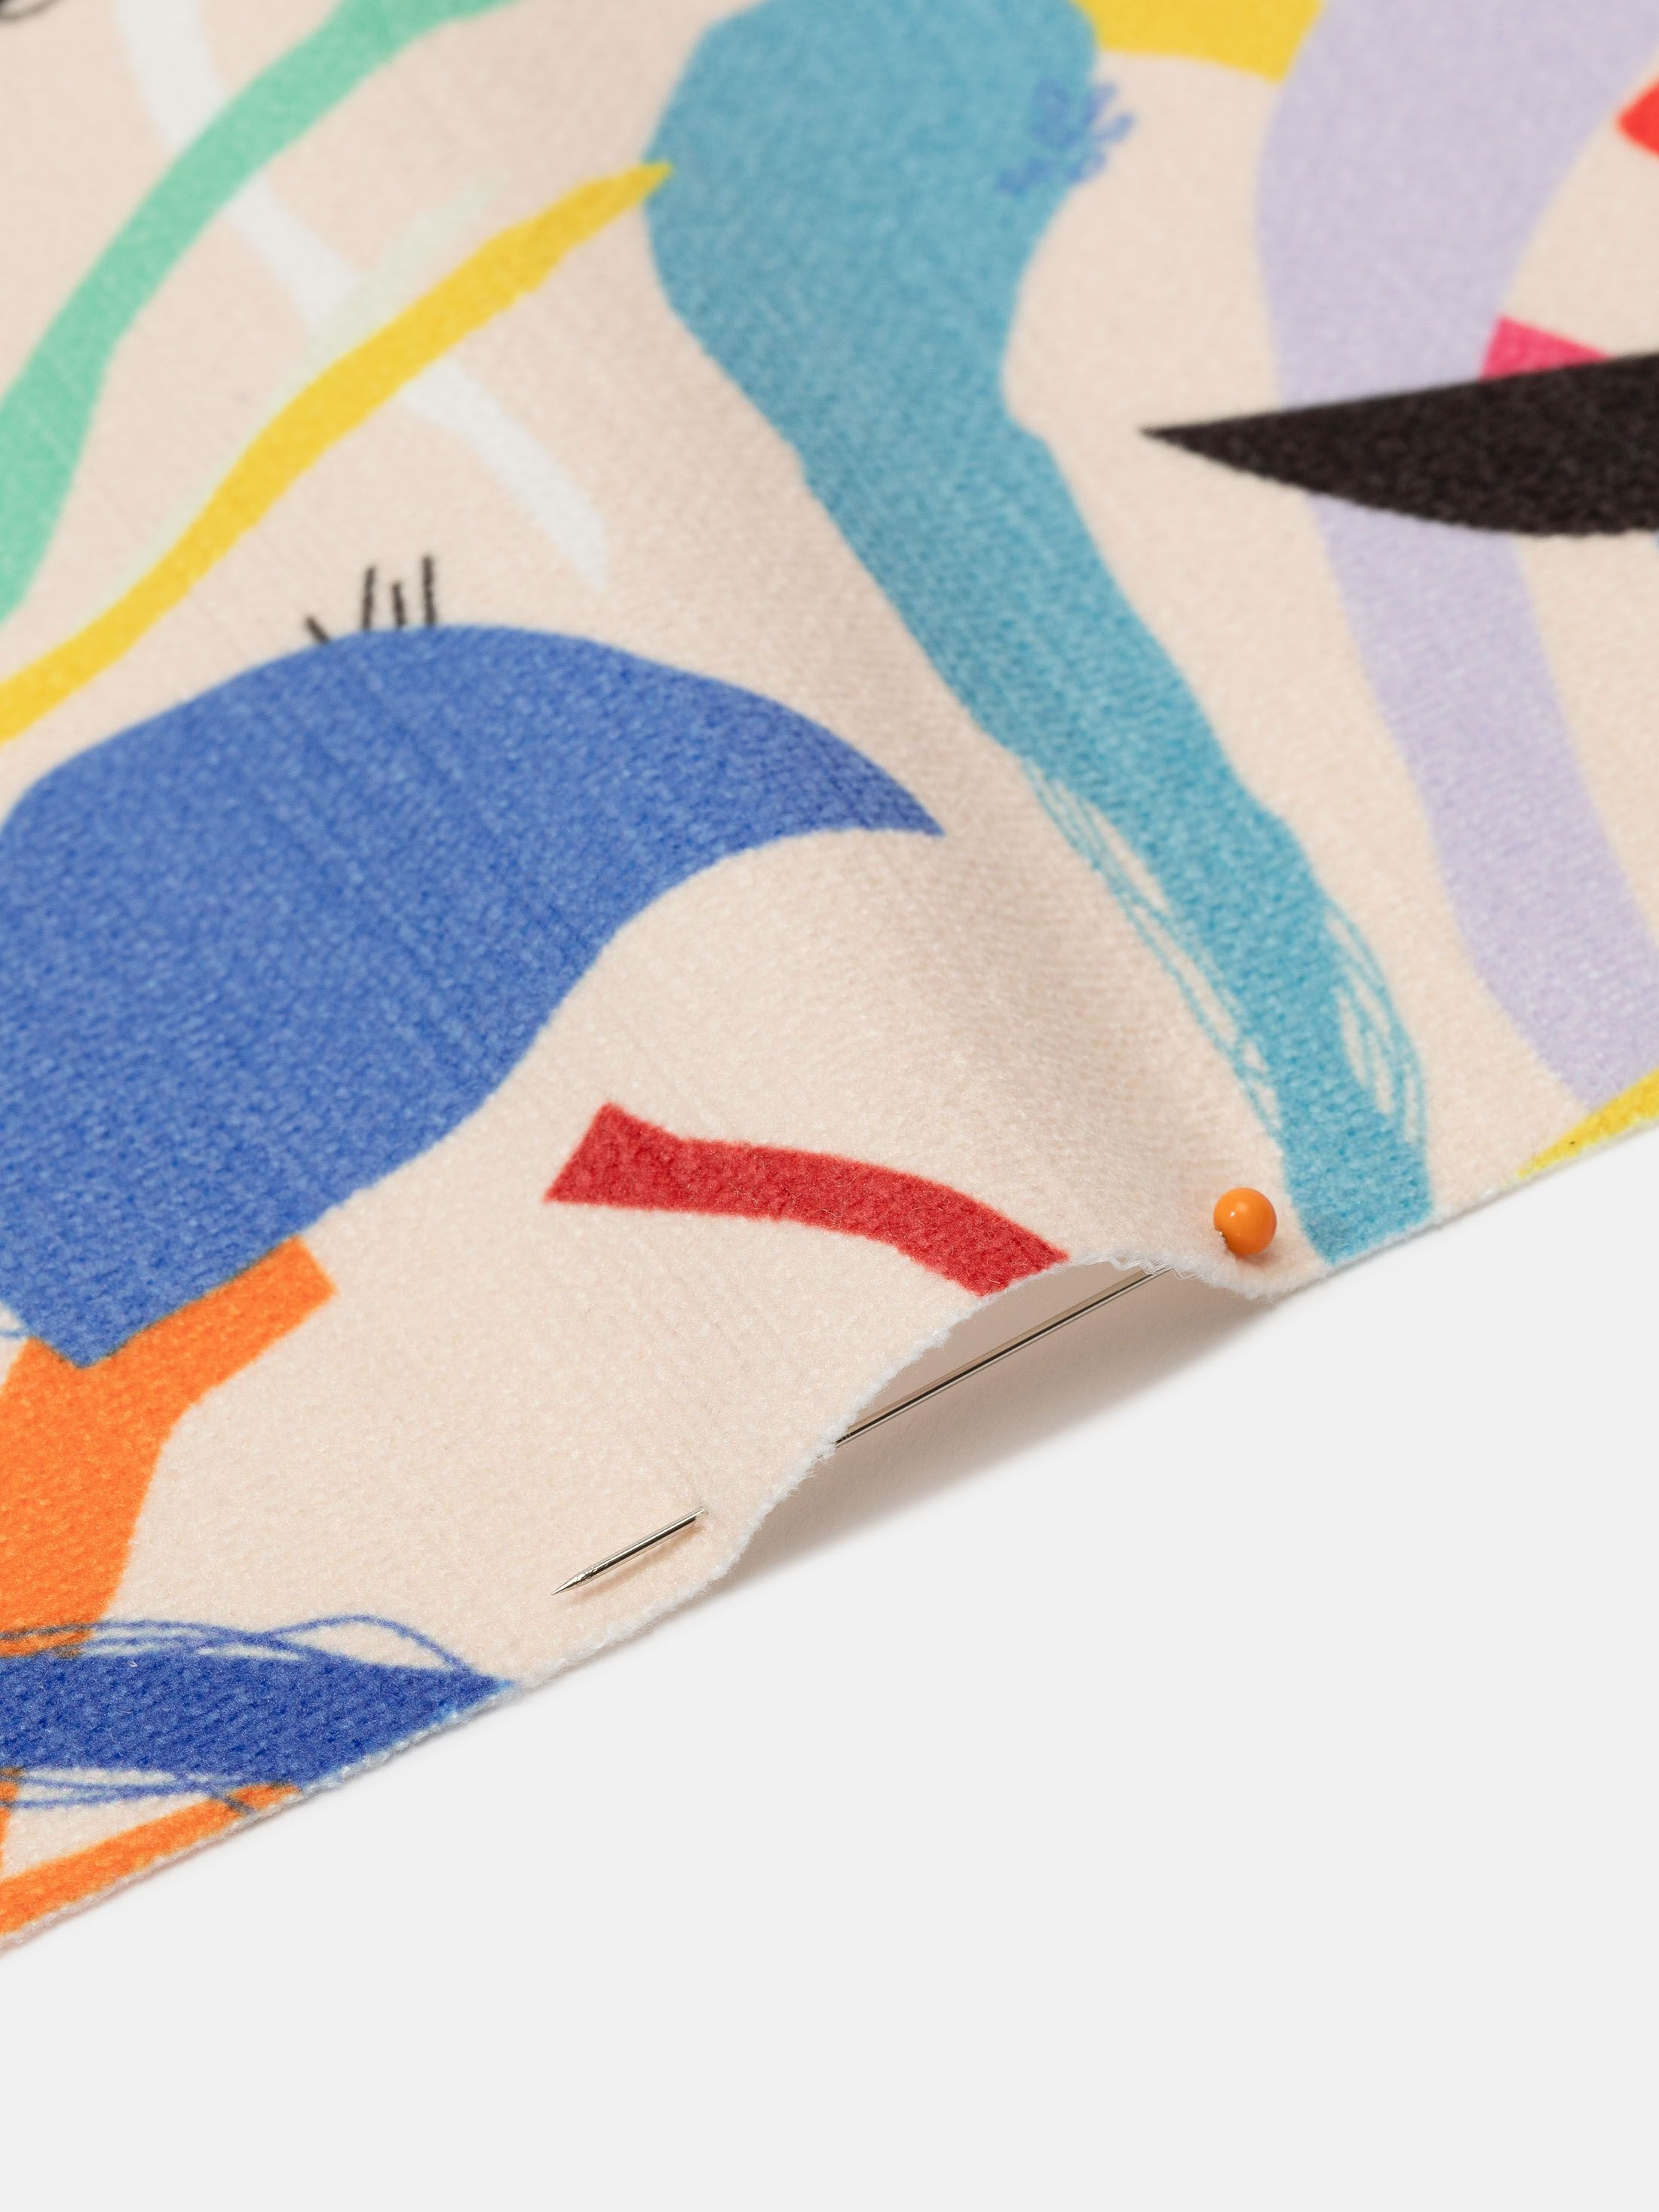 Chenille digital print fabric prints edging